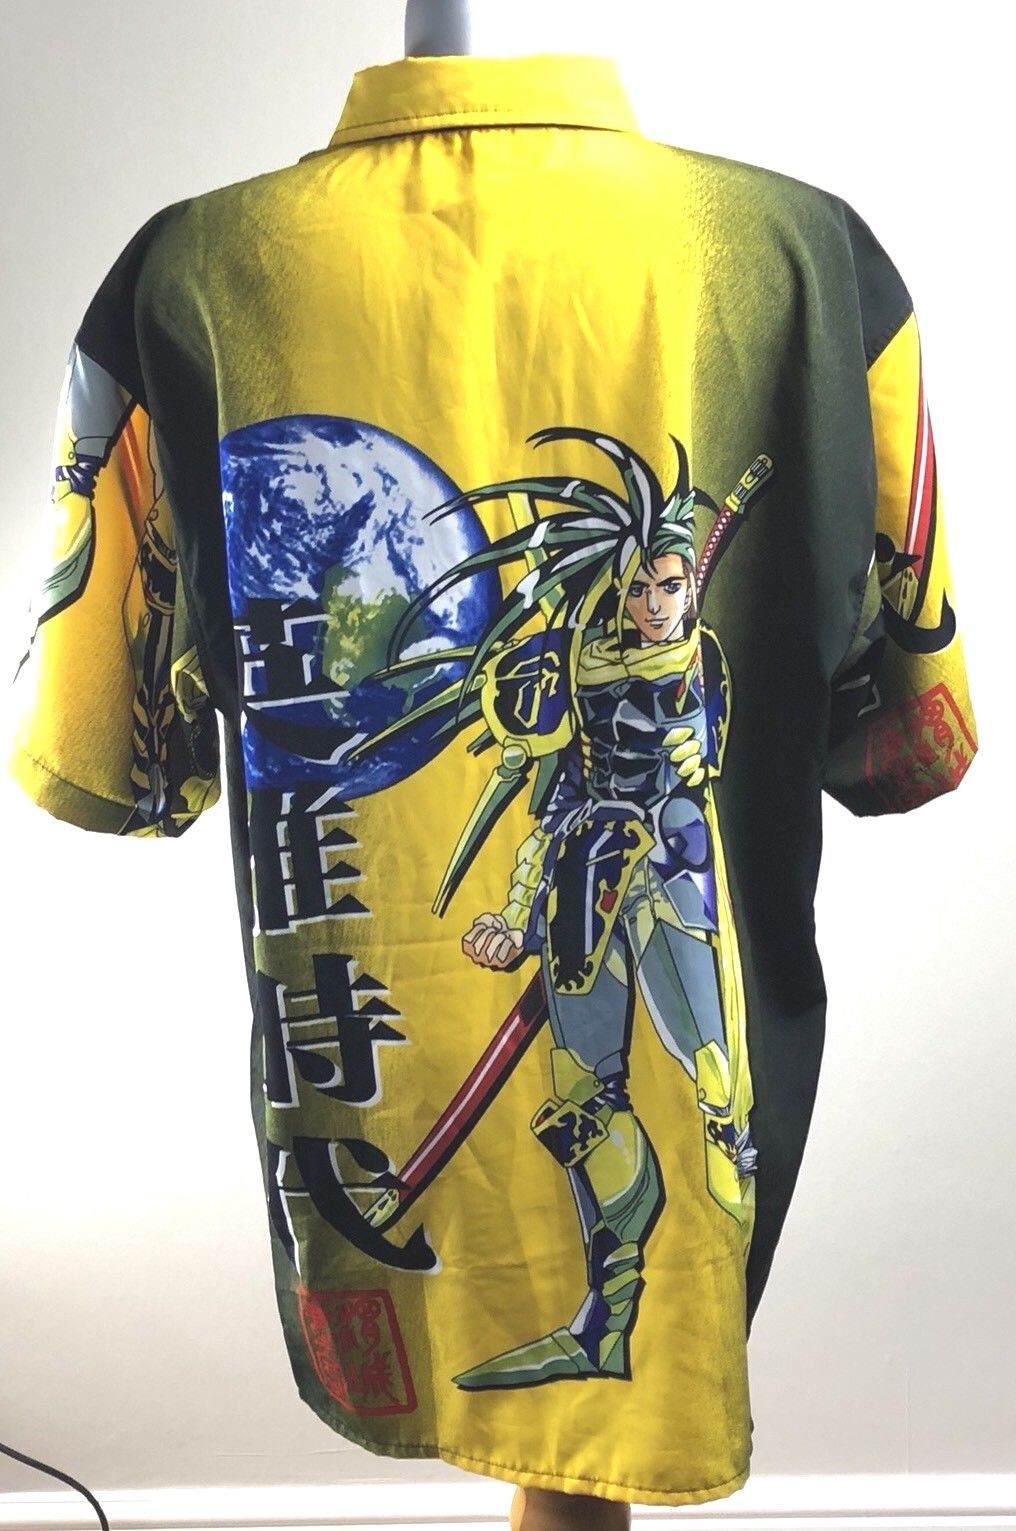 CHIC&TNK Hawaiian Shirt Men Streetwear Devil Anime